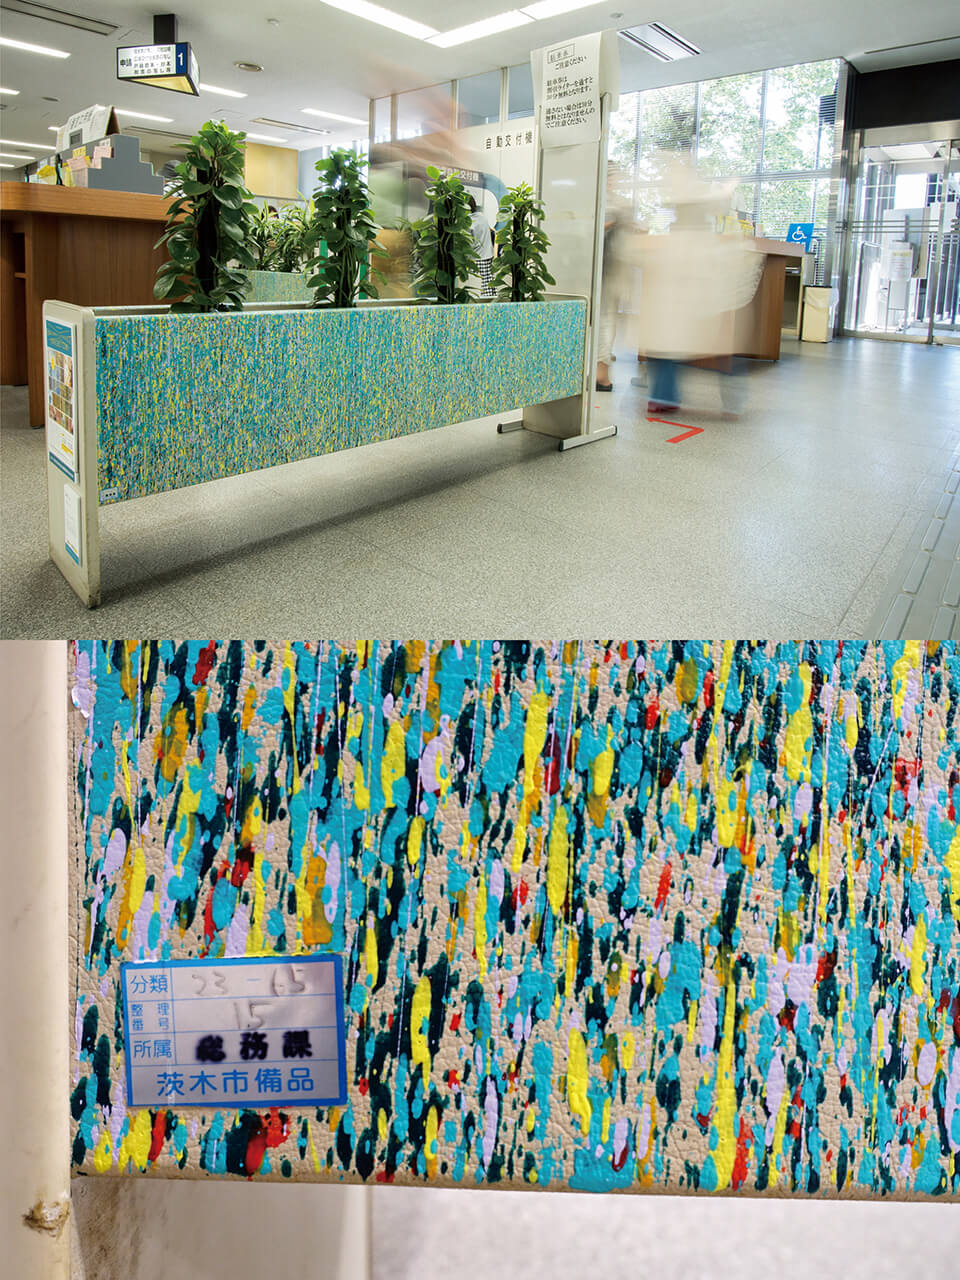 「WM」<br /> 2016-17<br /> acrylic direct on planter<br /> 茨木市役所本館1階 市民課前/大阪